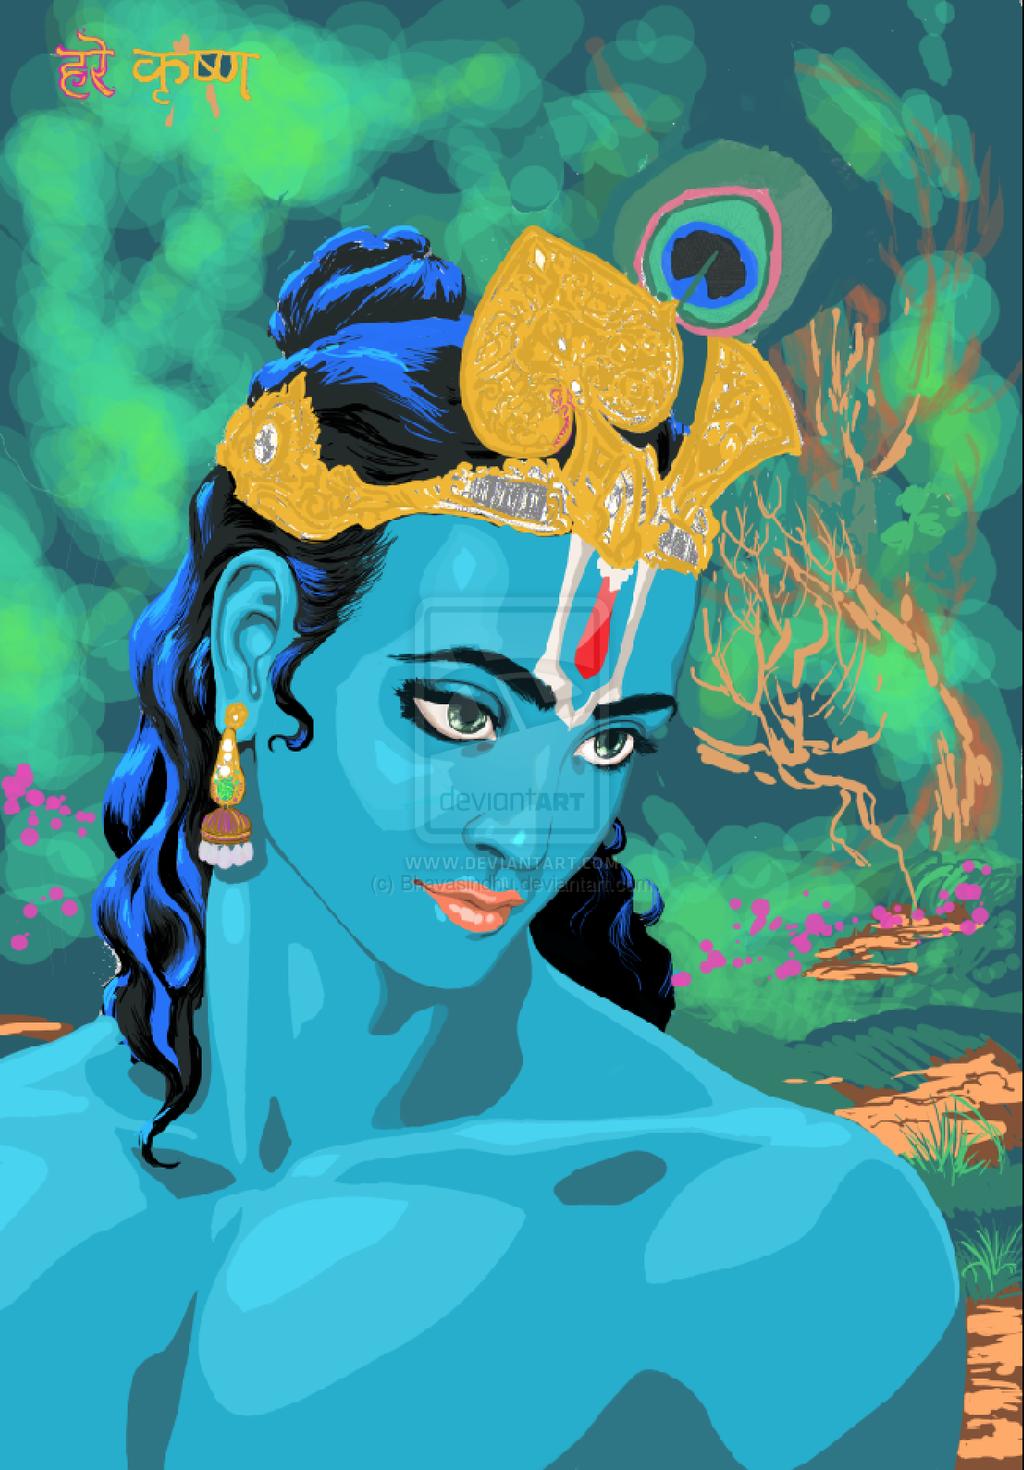 photoshop_of_sketch_of_shri_krishna_by_bhavasindhu-d7mb9bh